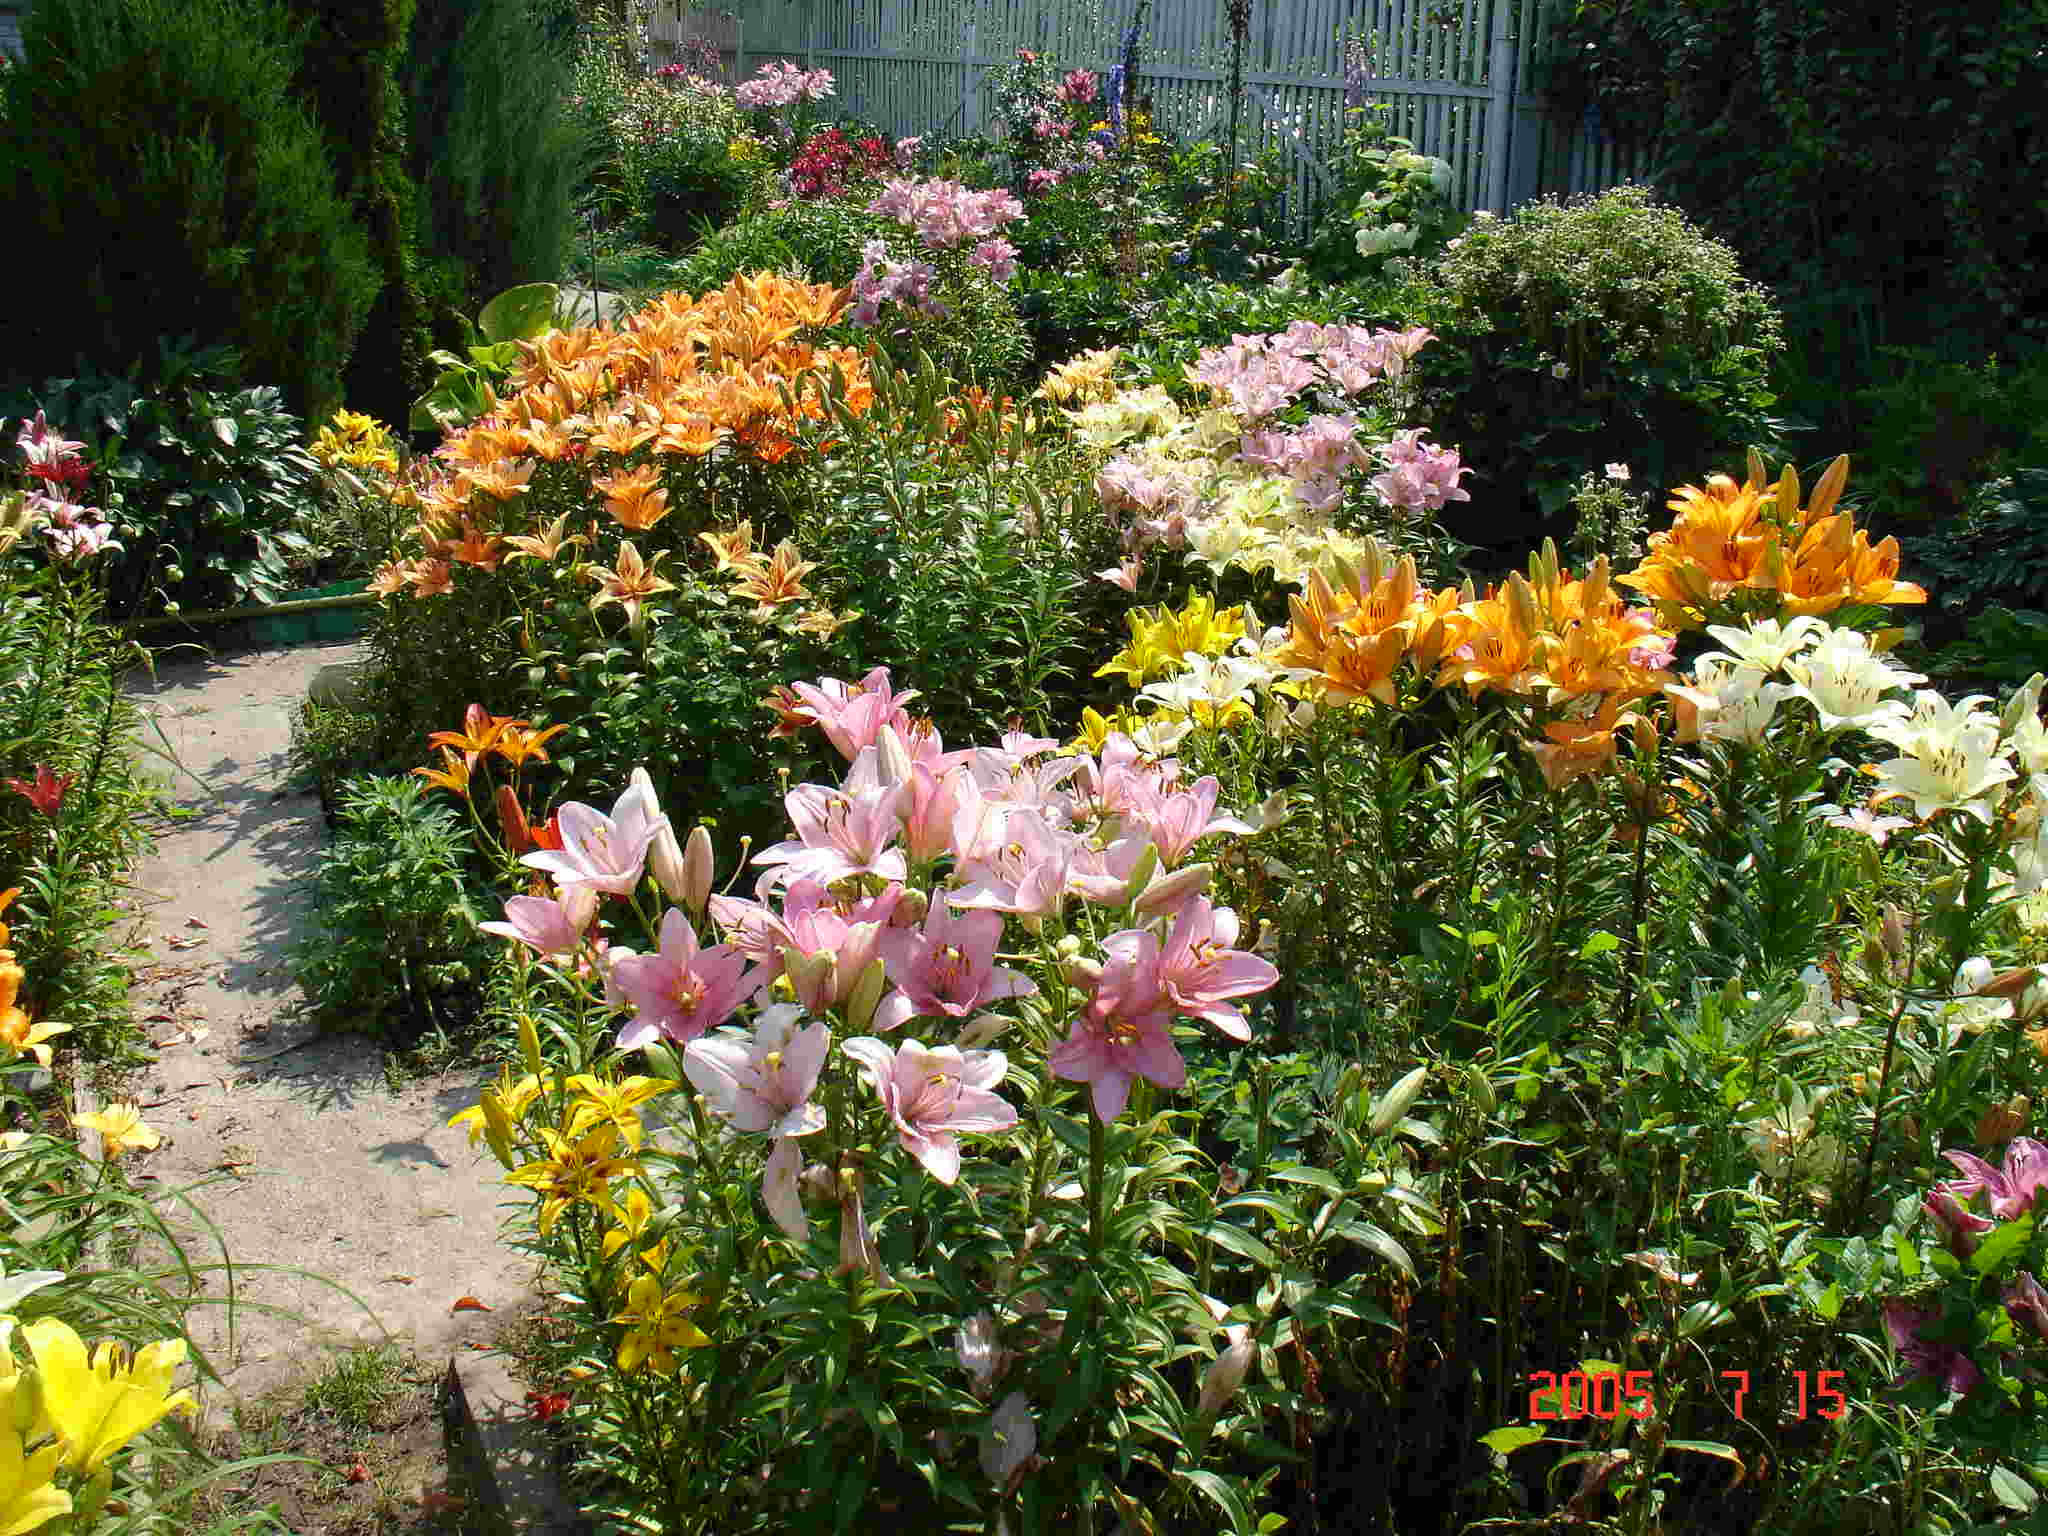 Lilies in the garden.